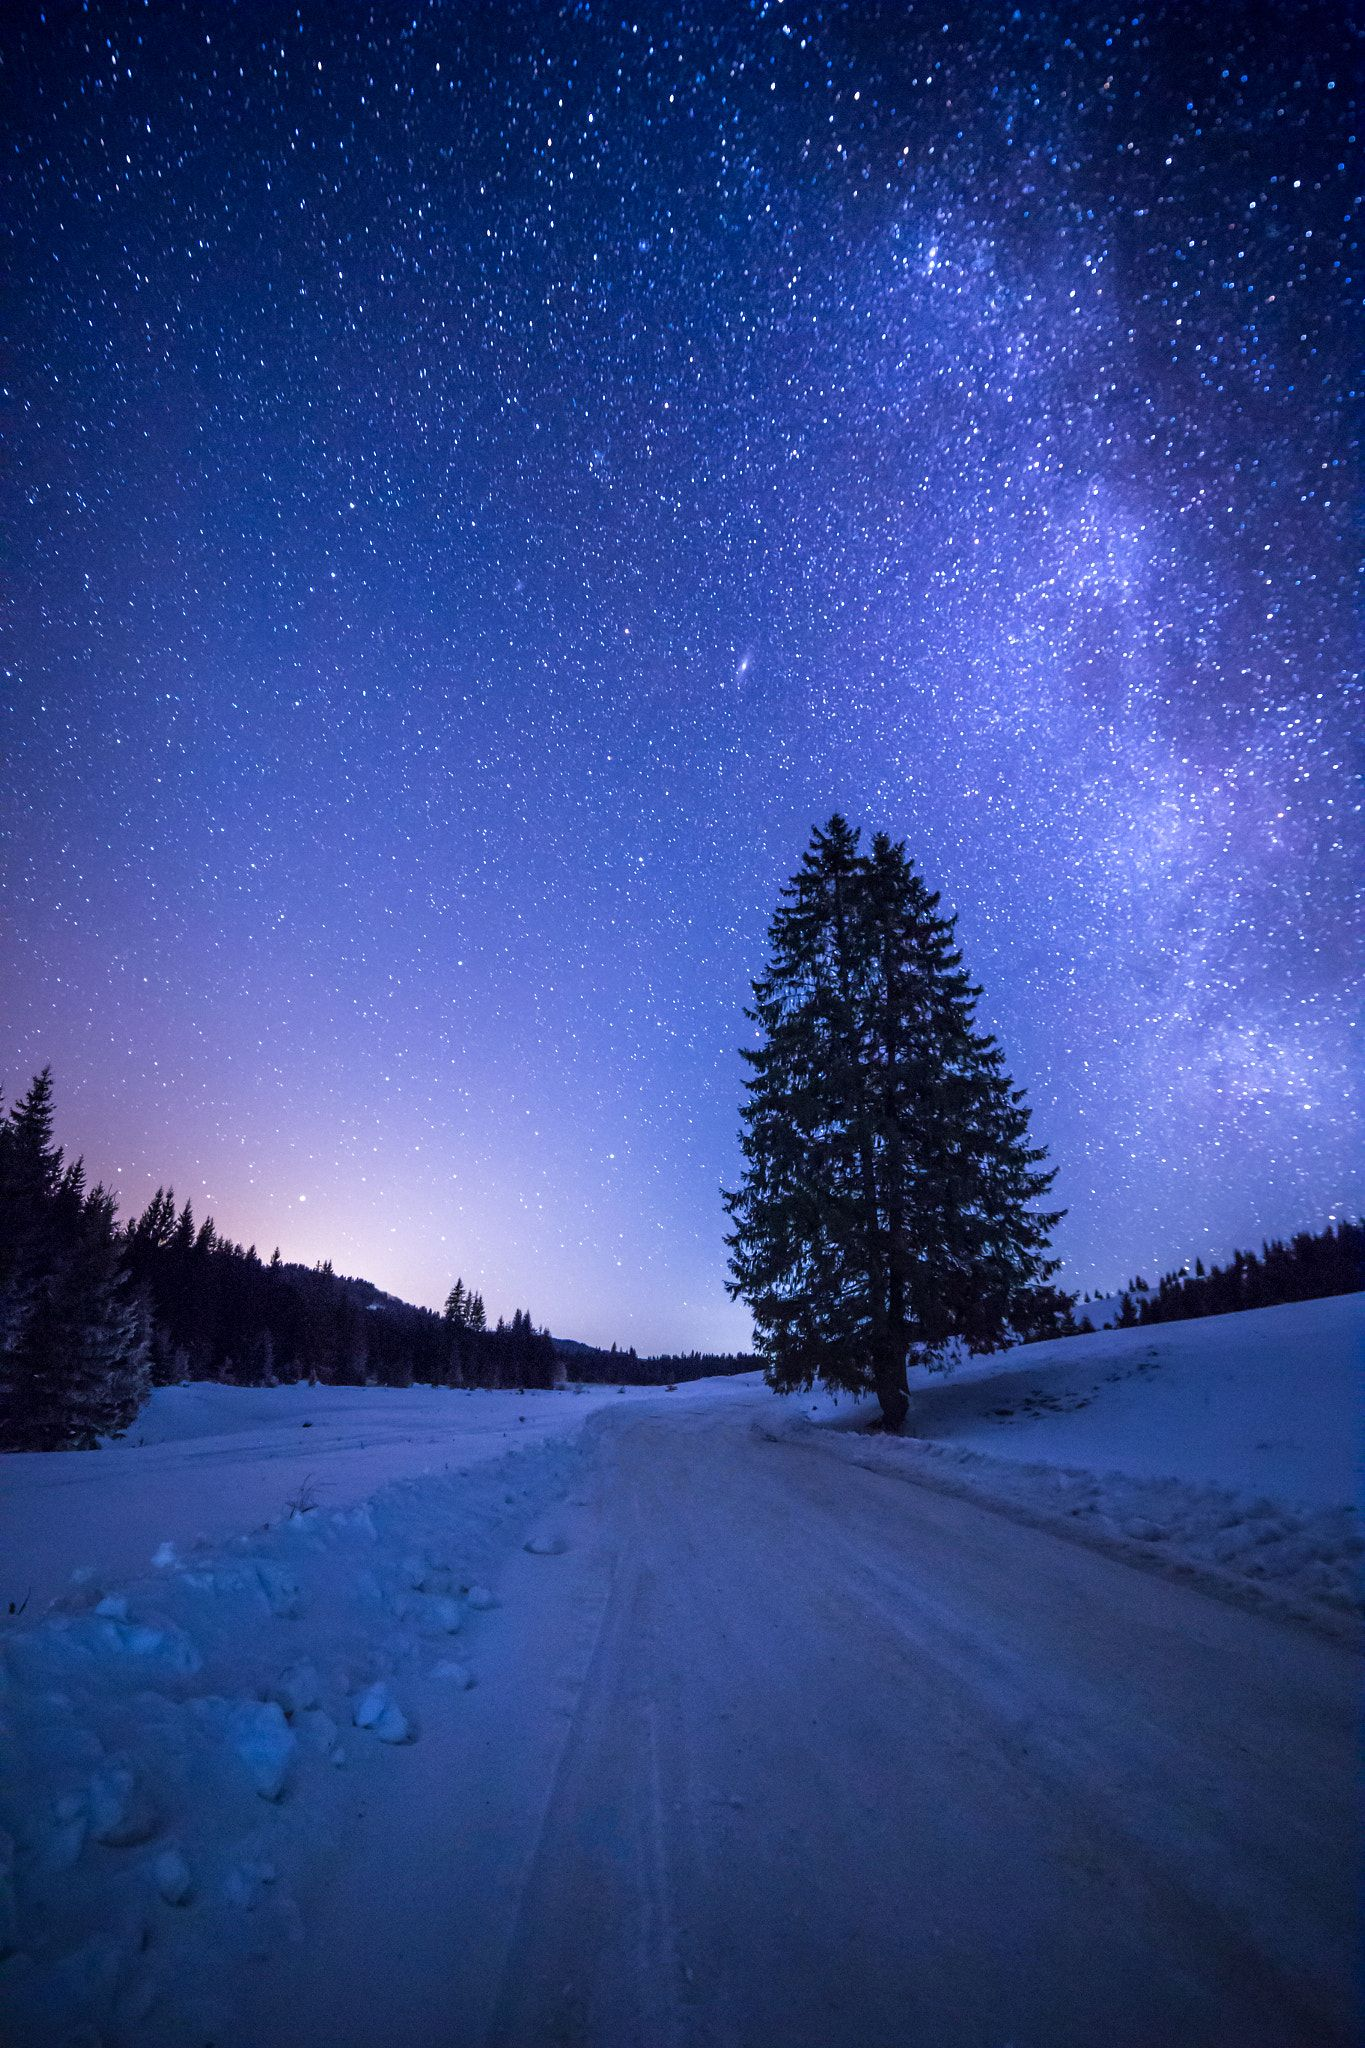 Night Scene In Comandau Romania By Tinu Coman Night Stars Winter Milkyway Road Trees Night Scene Winter Sky Beautiful Photos Of Nature